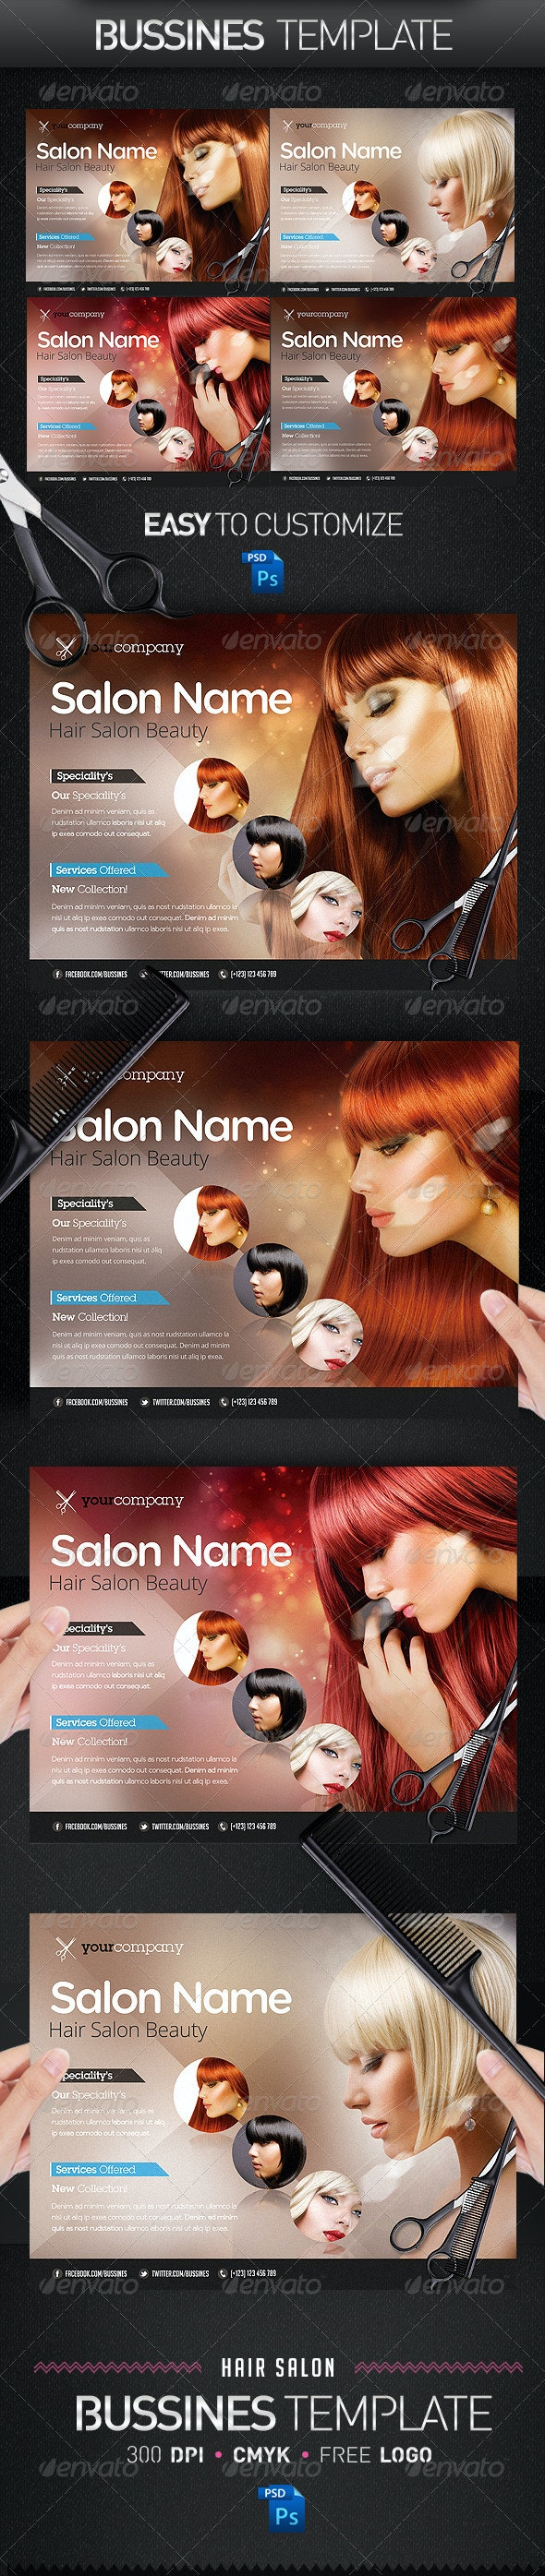 Hair Salon PRO Bussines Promotional Flyer - Commerce Flyers